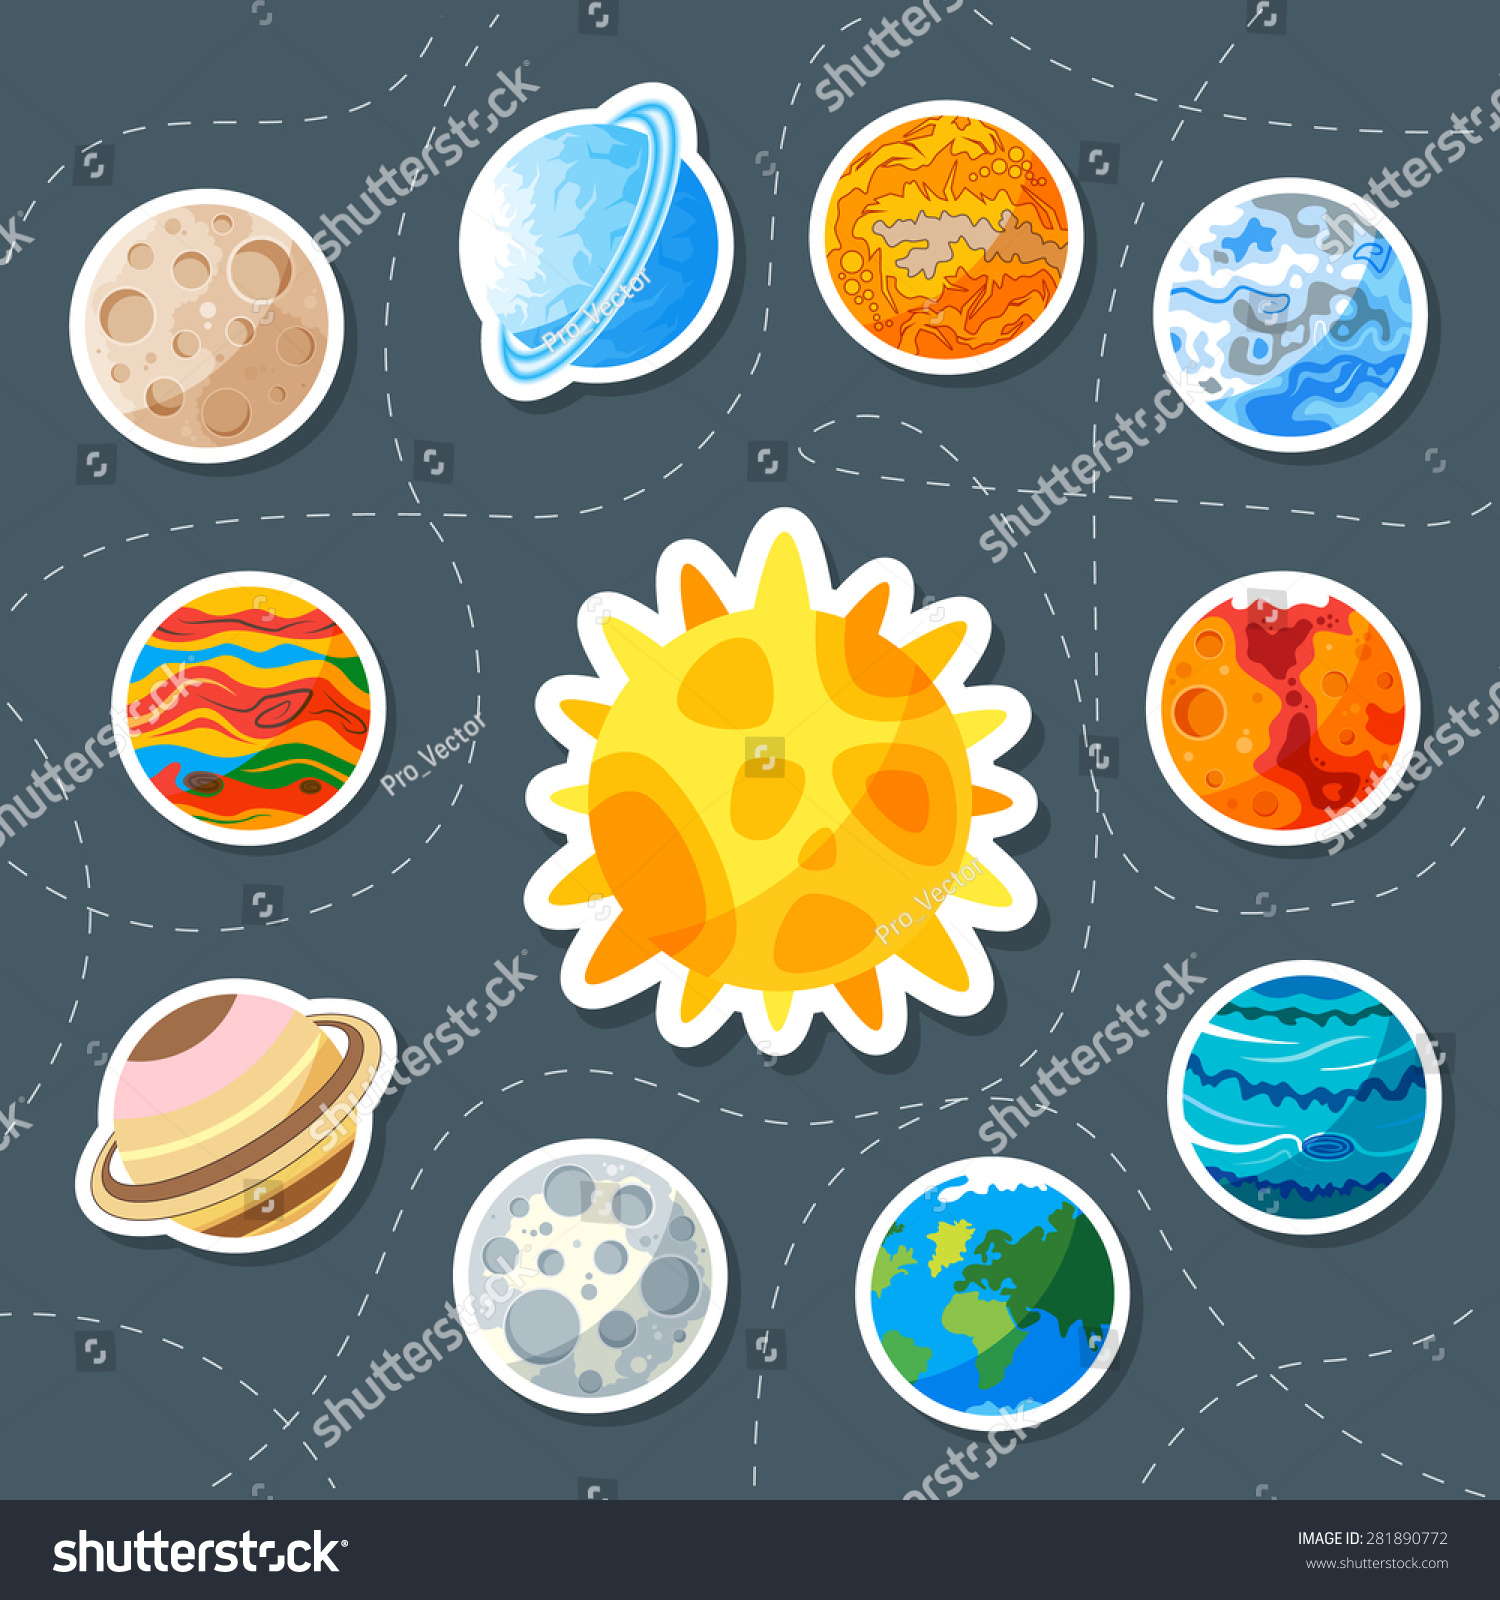 Royalty-free Cute planet. Sticker. saturn, mars ...